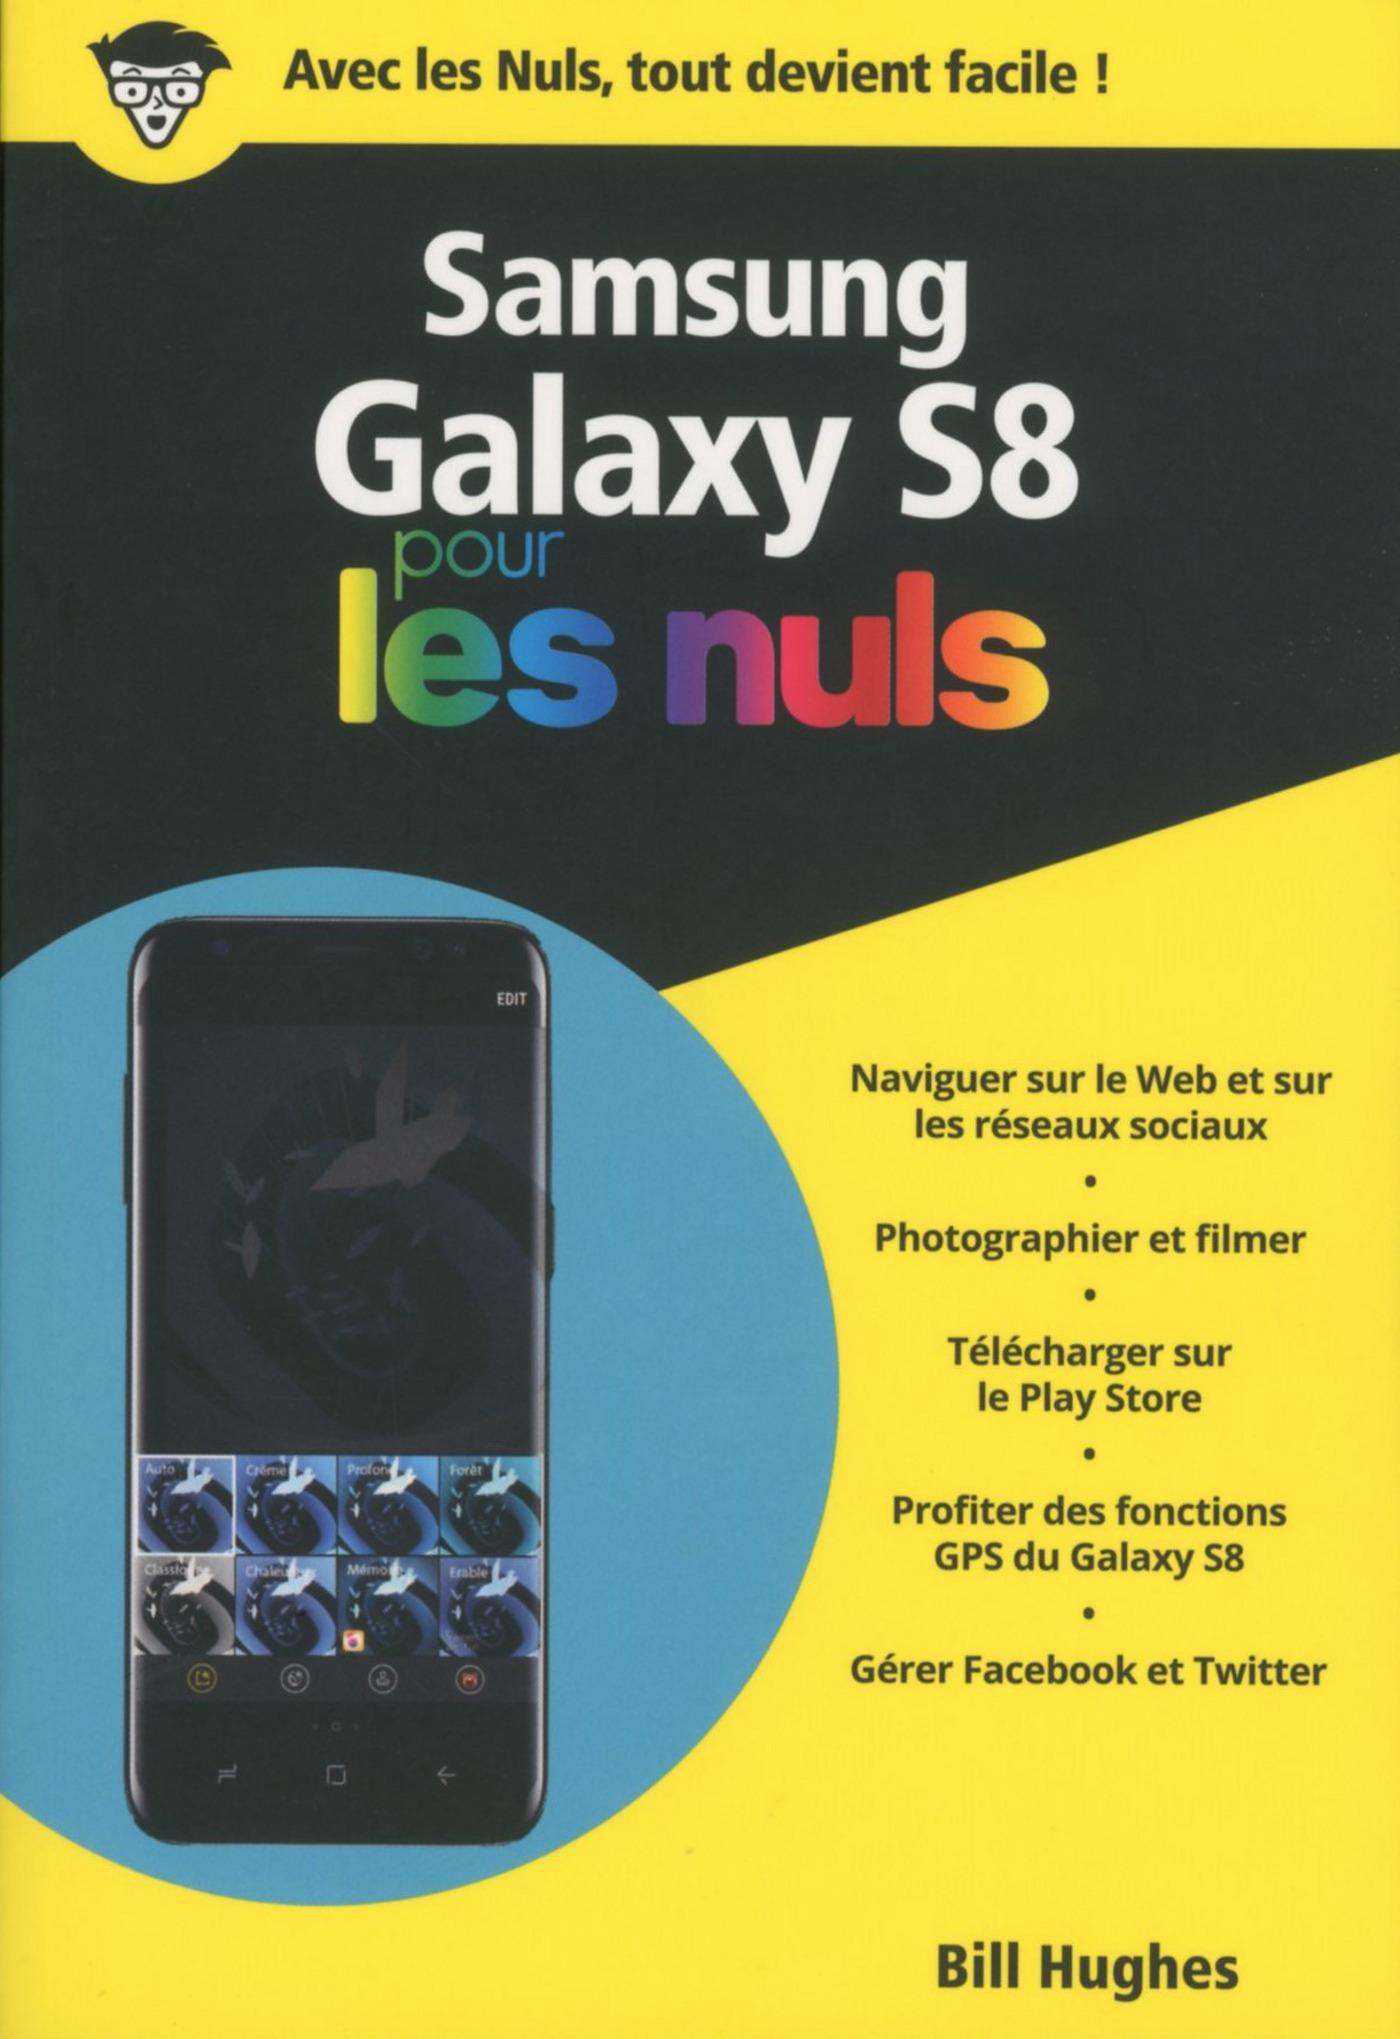 Samsung Galaxy S8 pour les Nuls poche